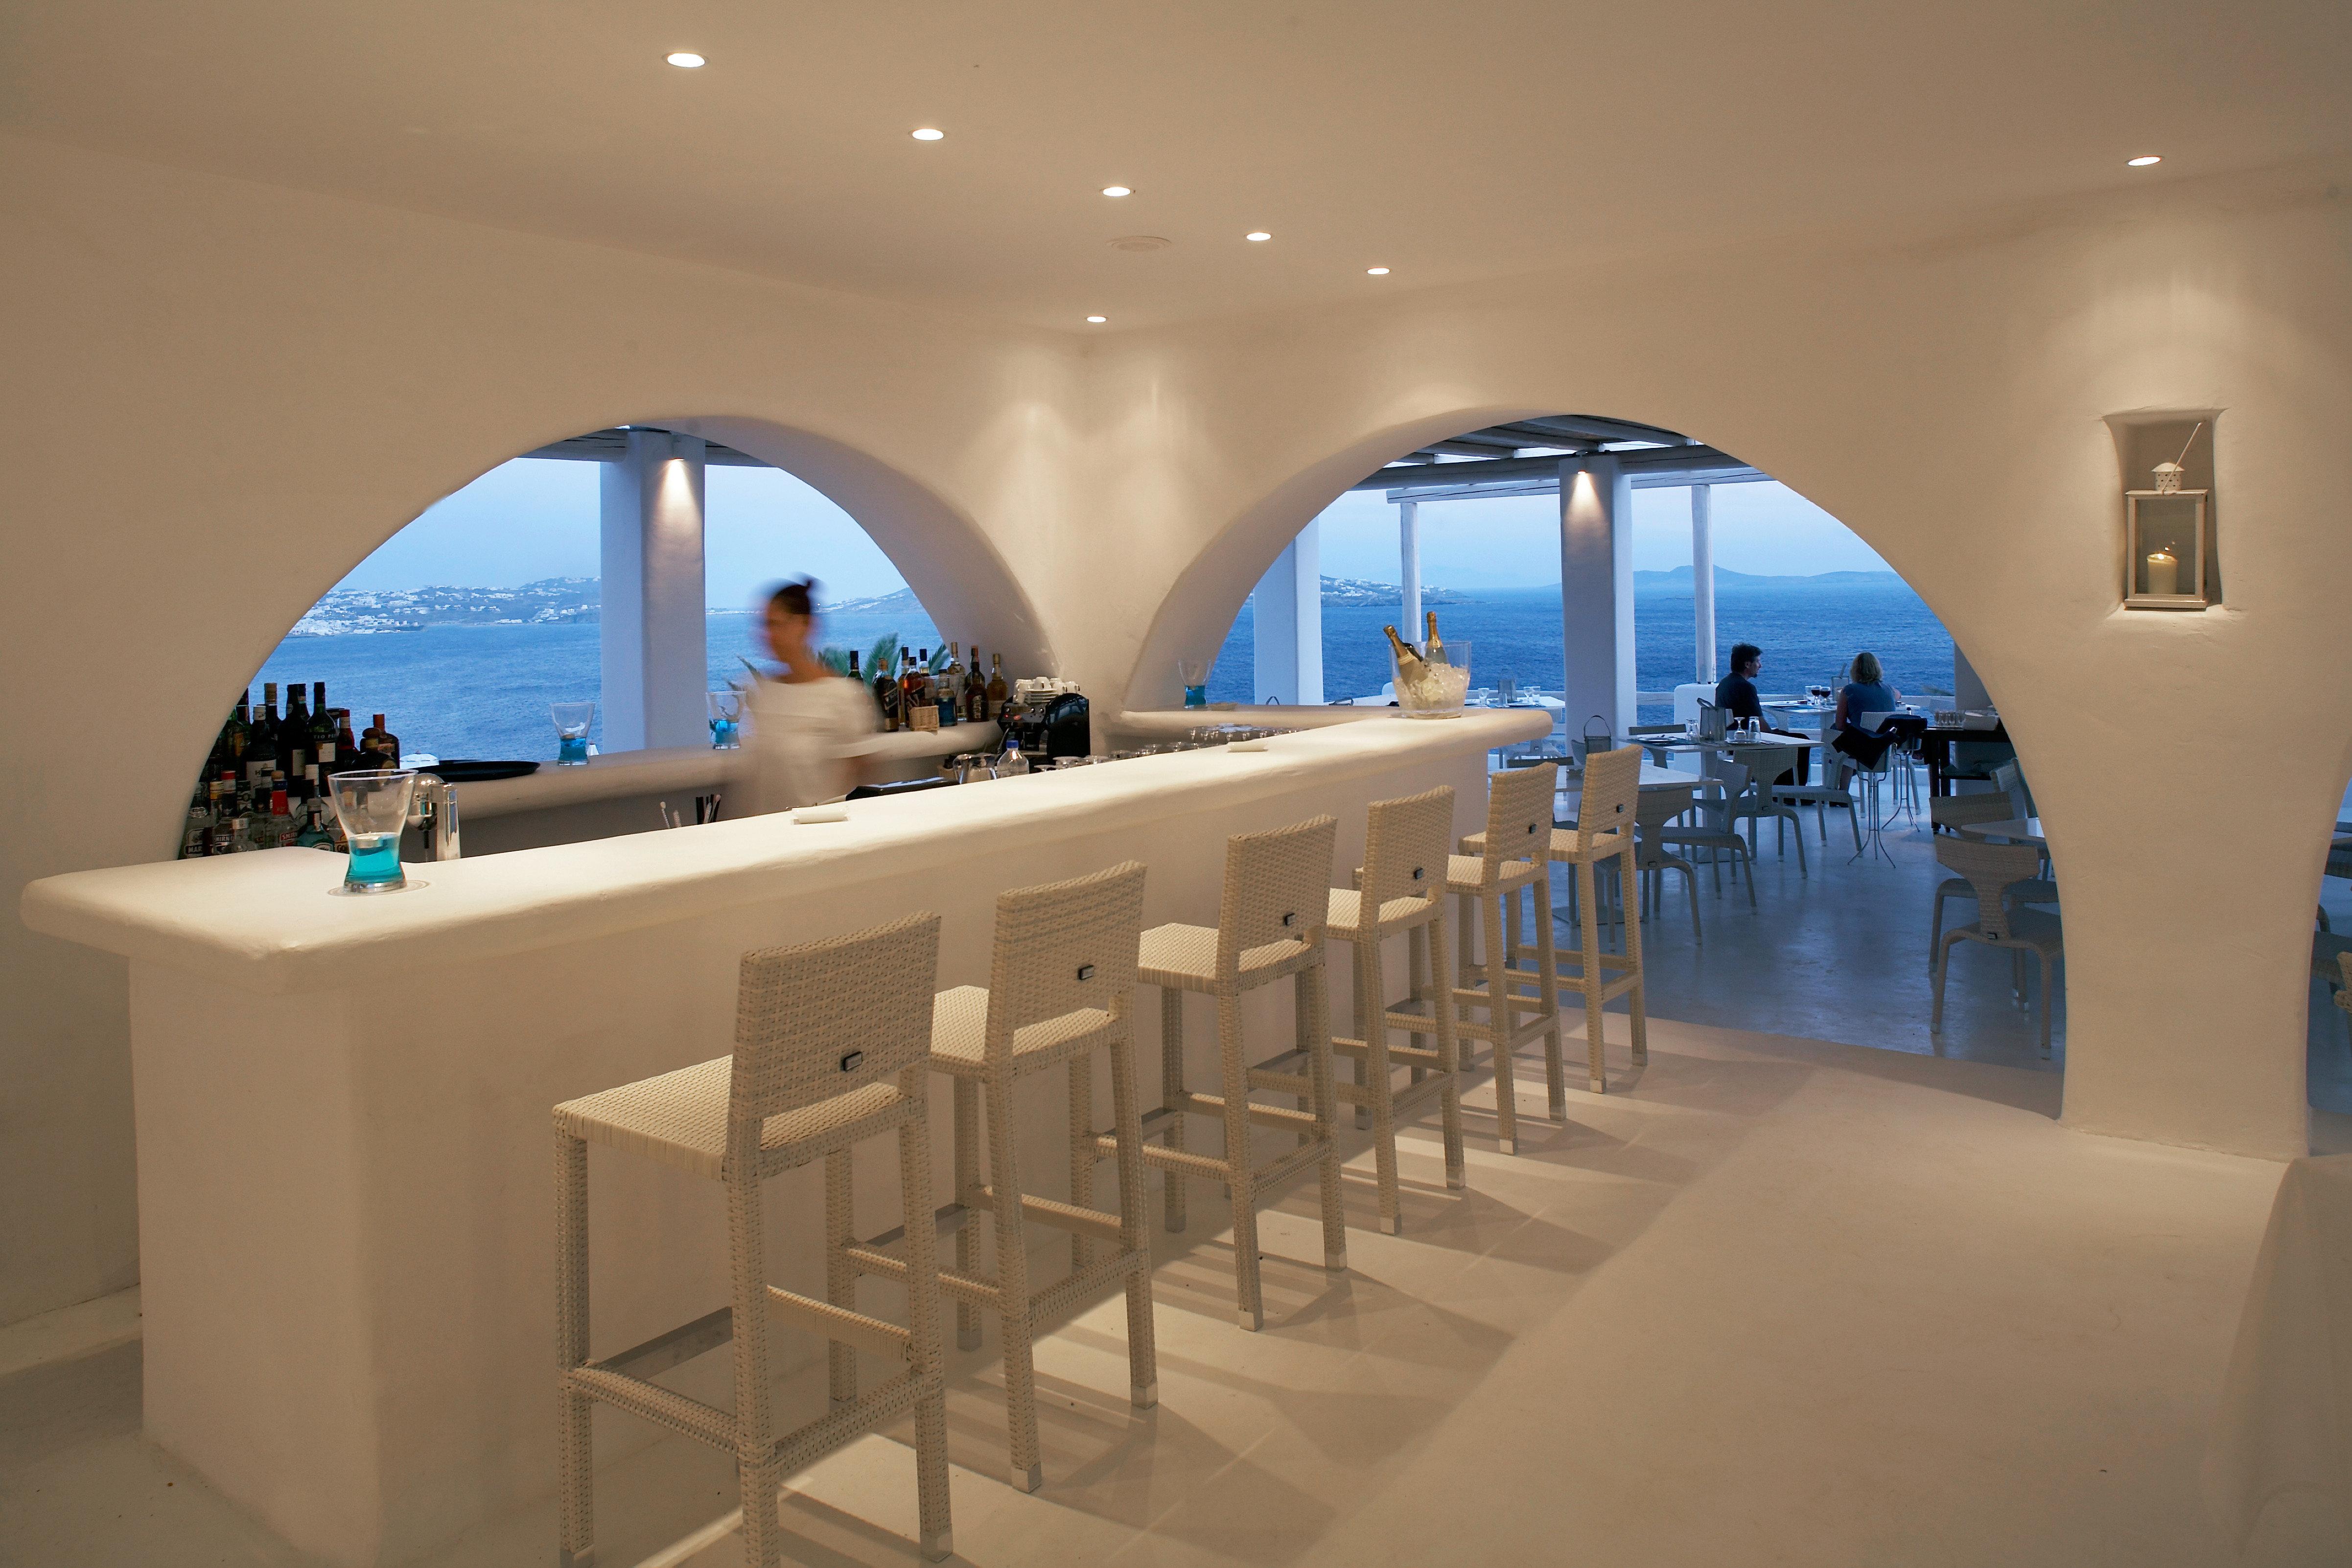 Bar Boutique Drink Luxury Scenic views Architecture restaurant tourist attraction